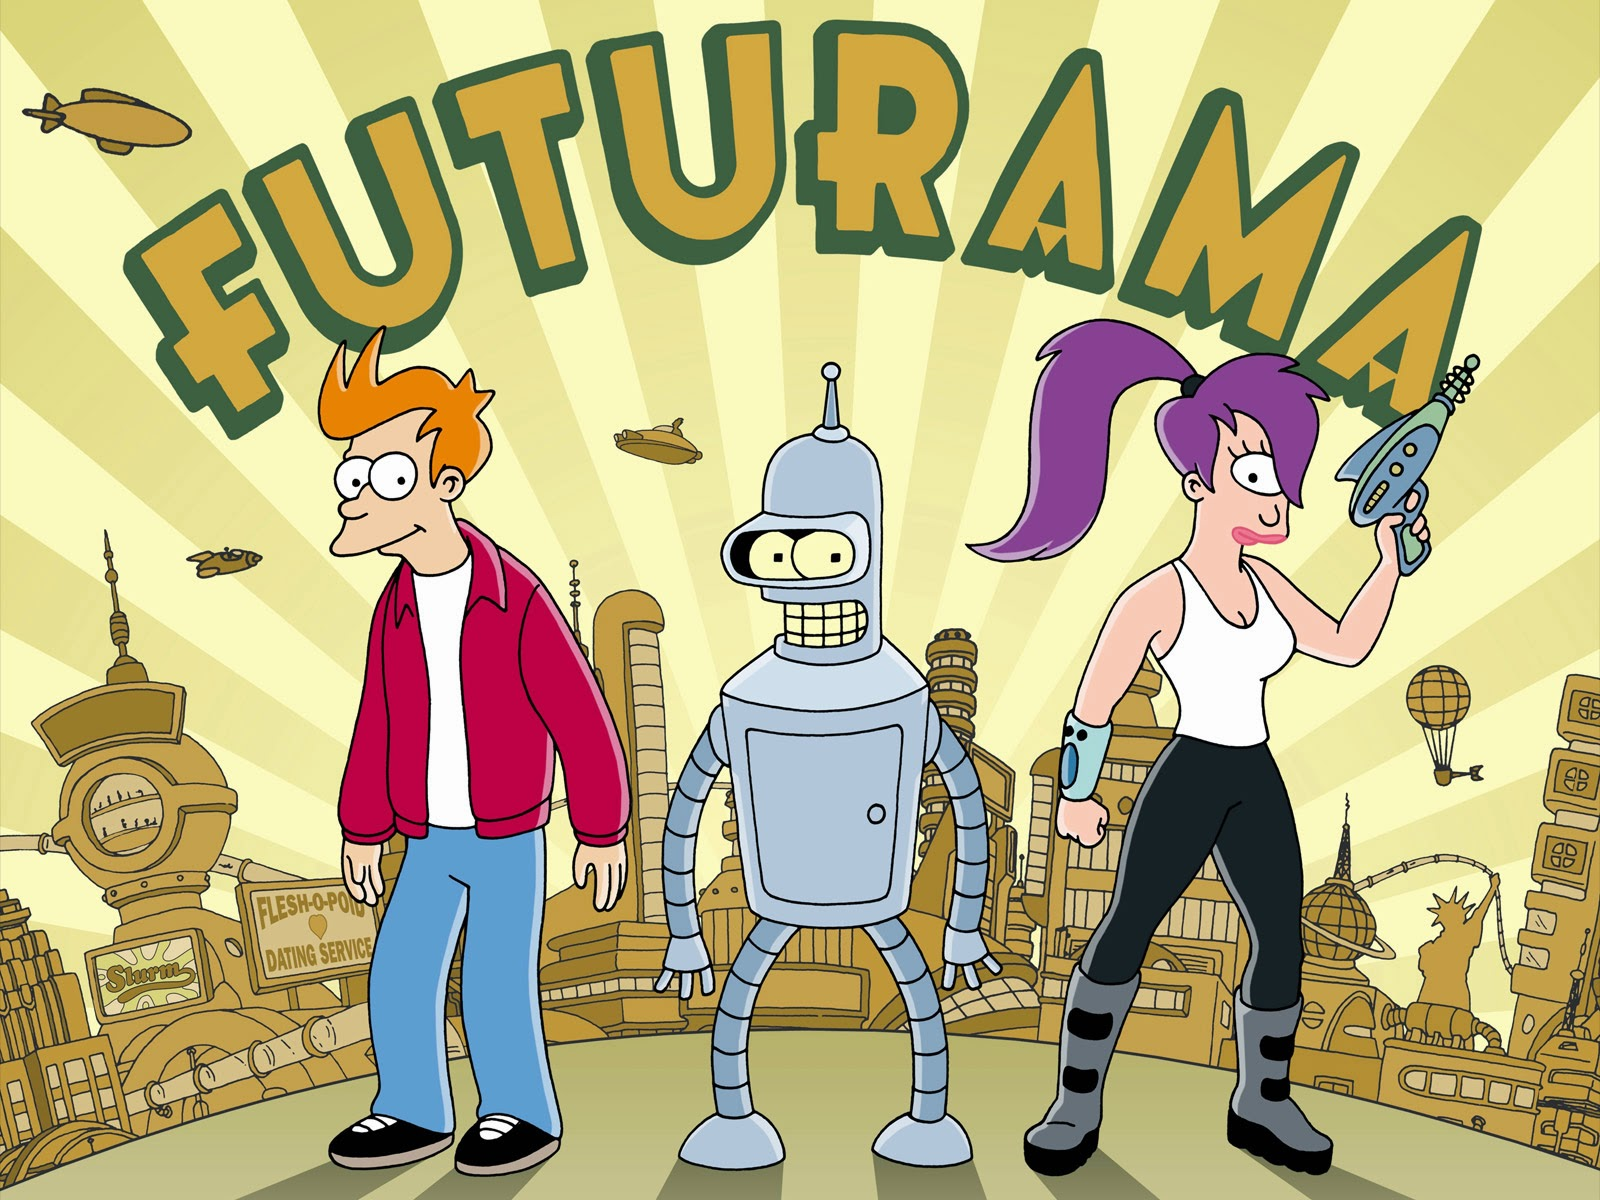 Futurama cz dabing online dating